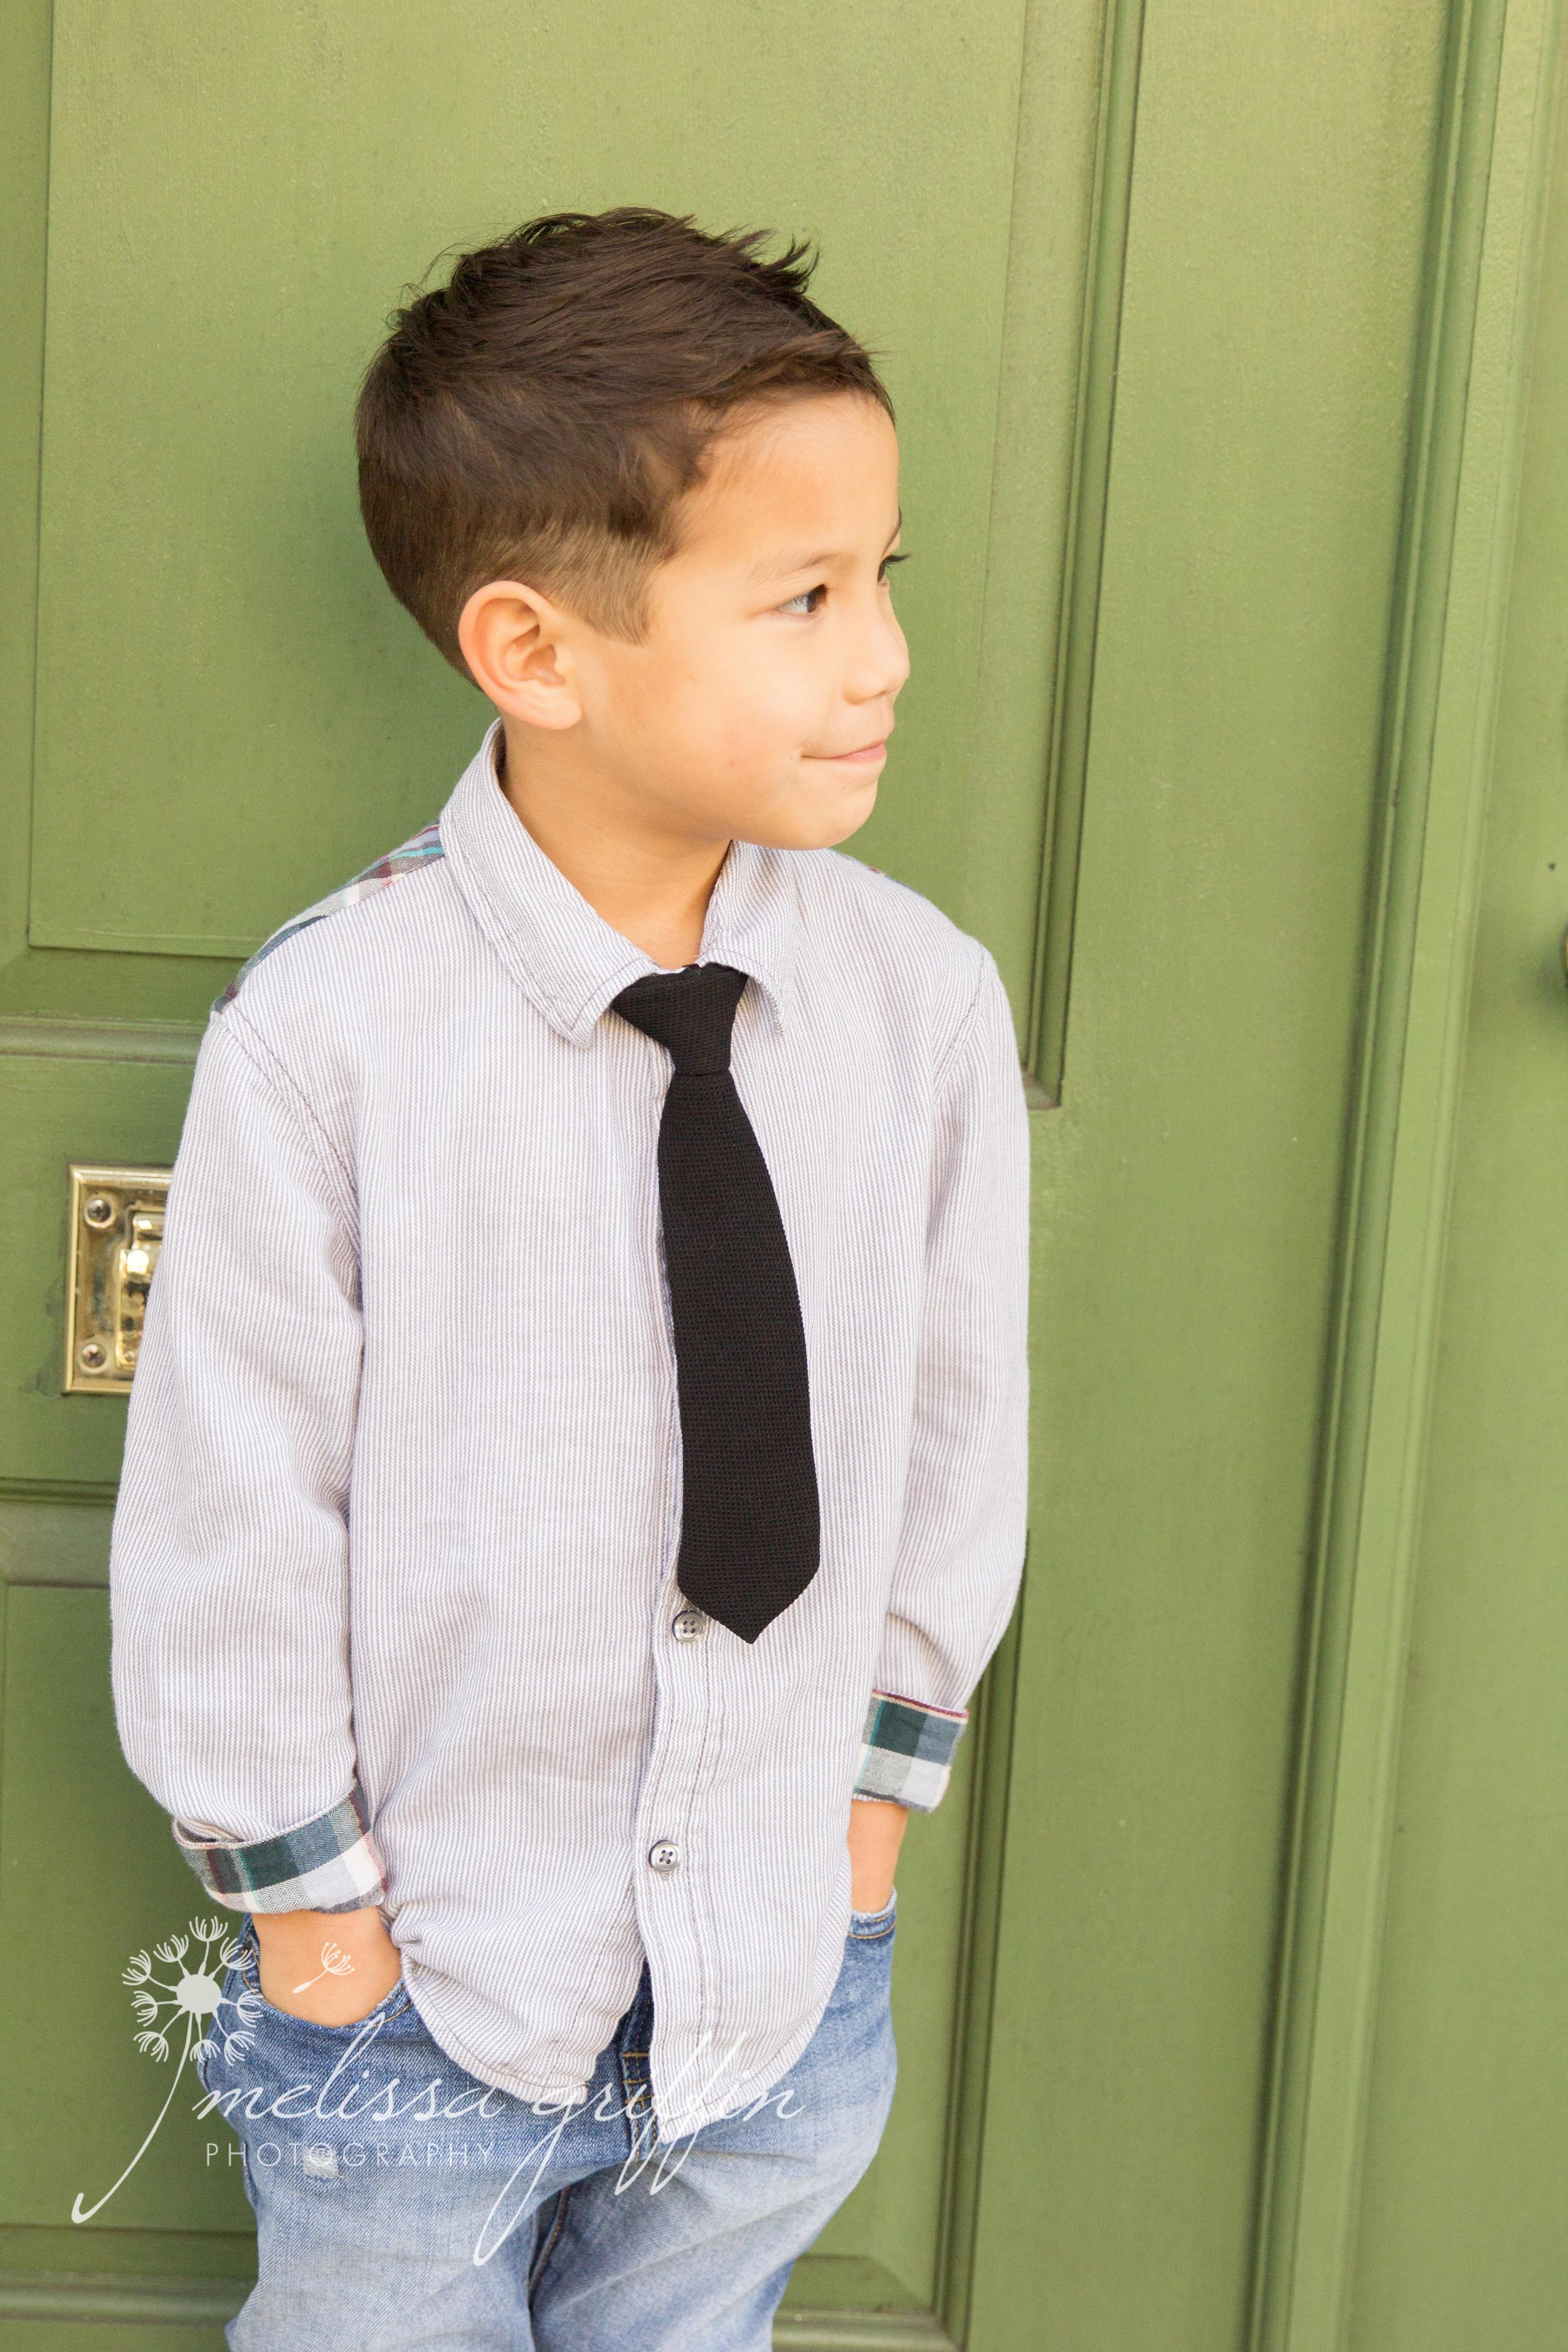 Target plaid shirt for boys